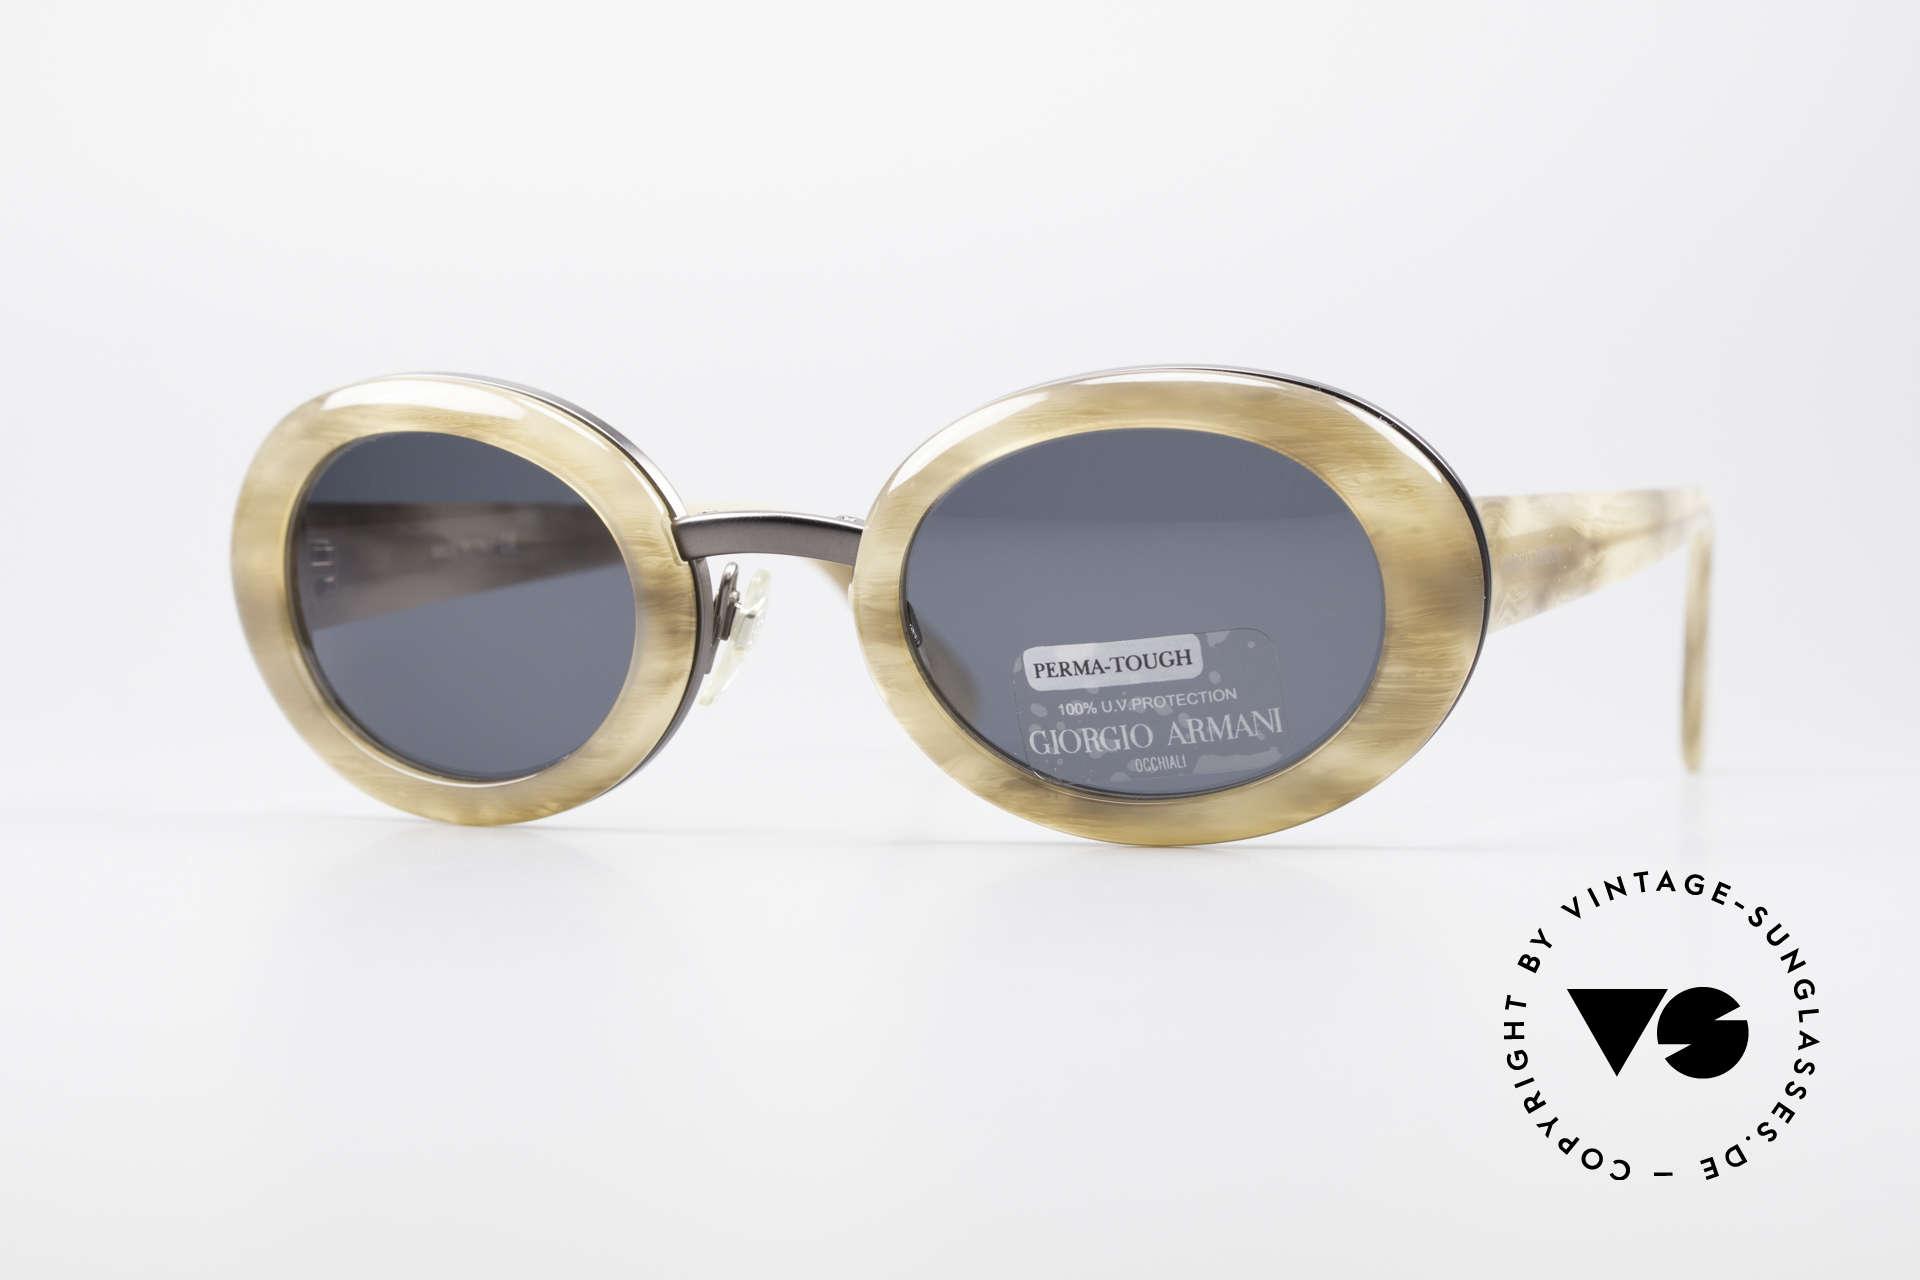 Giorgio Armani 945 Designer Sonnenbrille Damen, außergewöhnliche Giorgio Armani Designer-Sonnenbrille, Passend für Damen